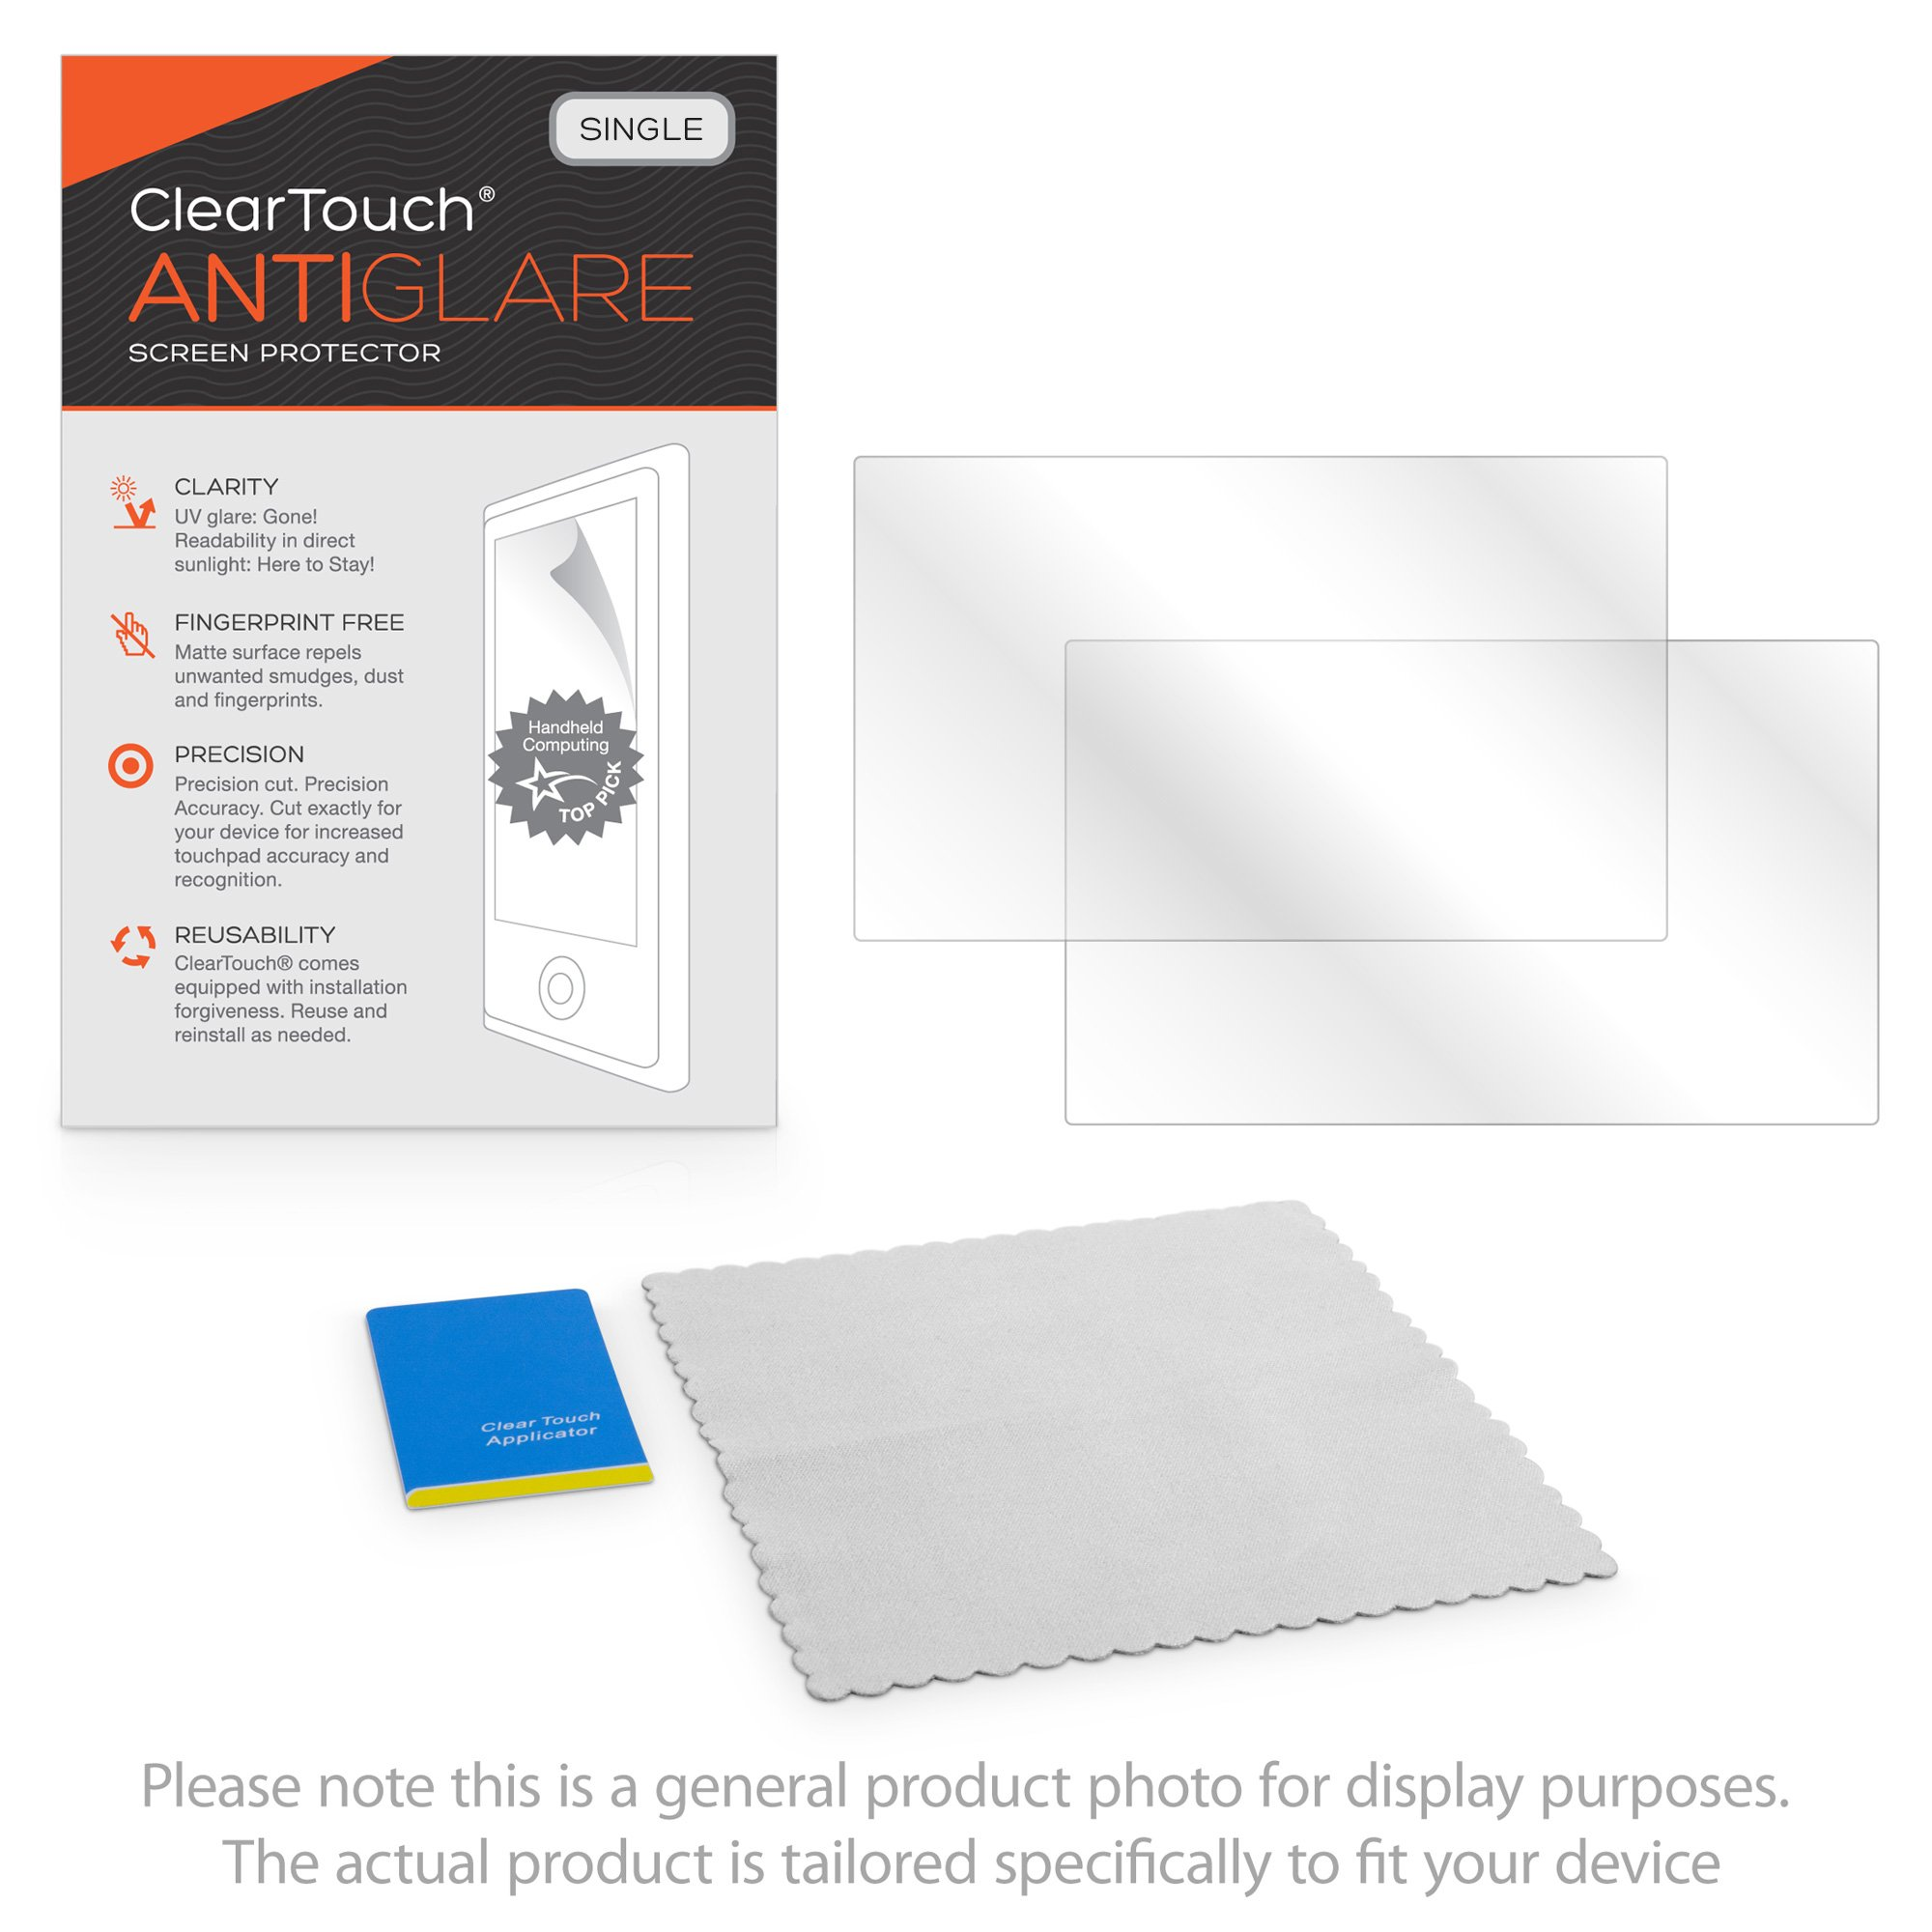 Panasonic Toughbook 18 CF-18 Screen Protector, BoxWave [ClearTouch Anti-Glare] Anti-Fingerprint, Scratch Proof Matte Film Shield for Panasonic Toughbook 18 CF-18, CF-19